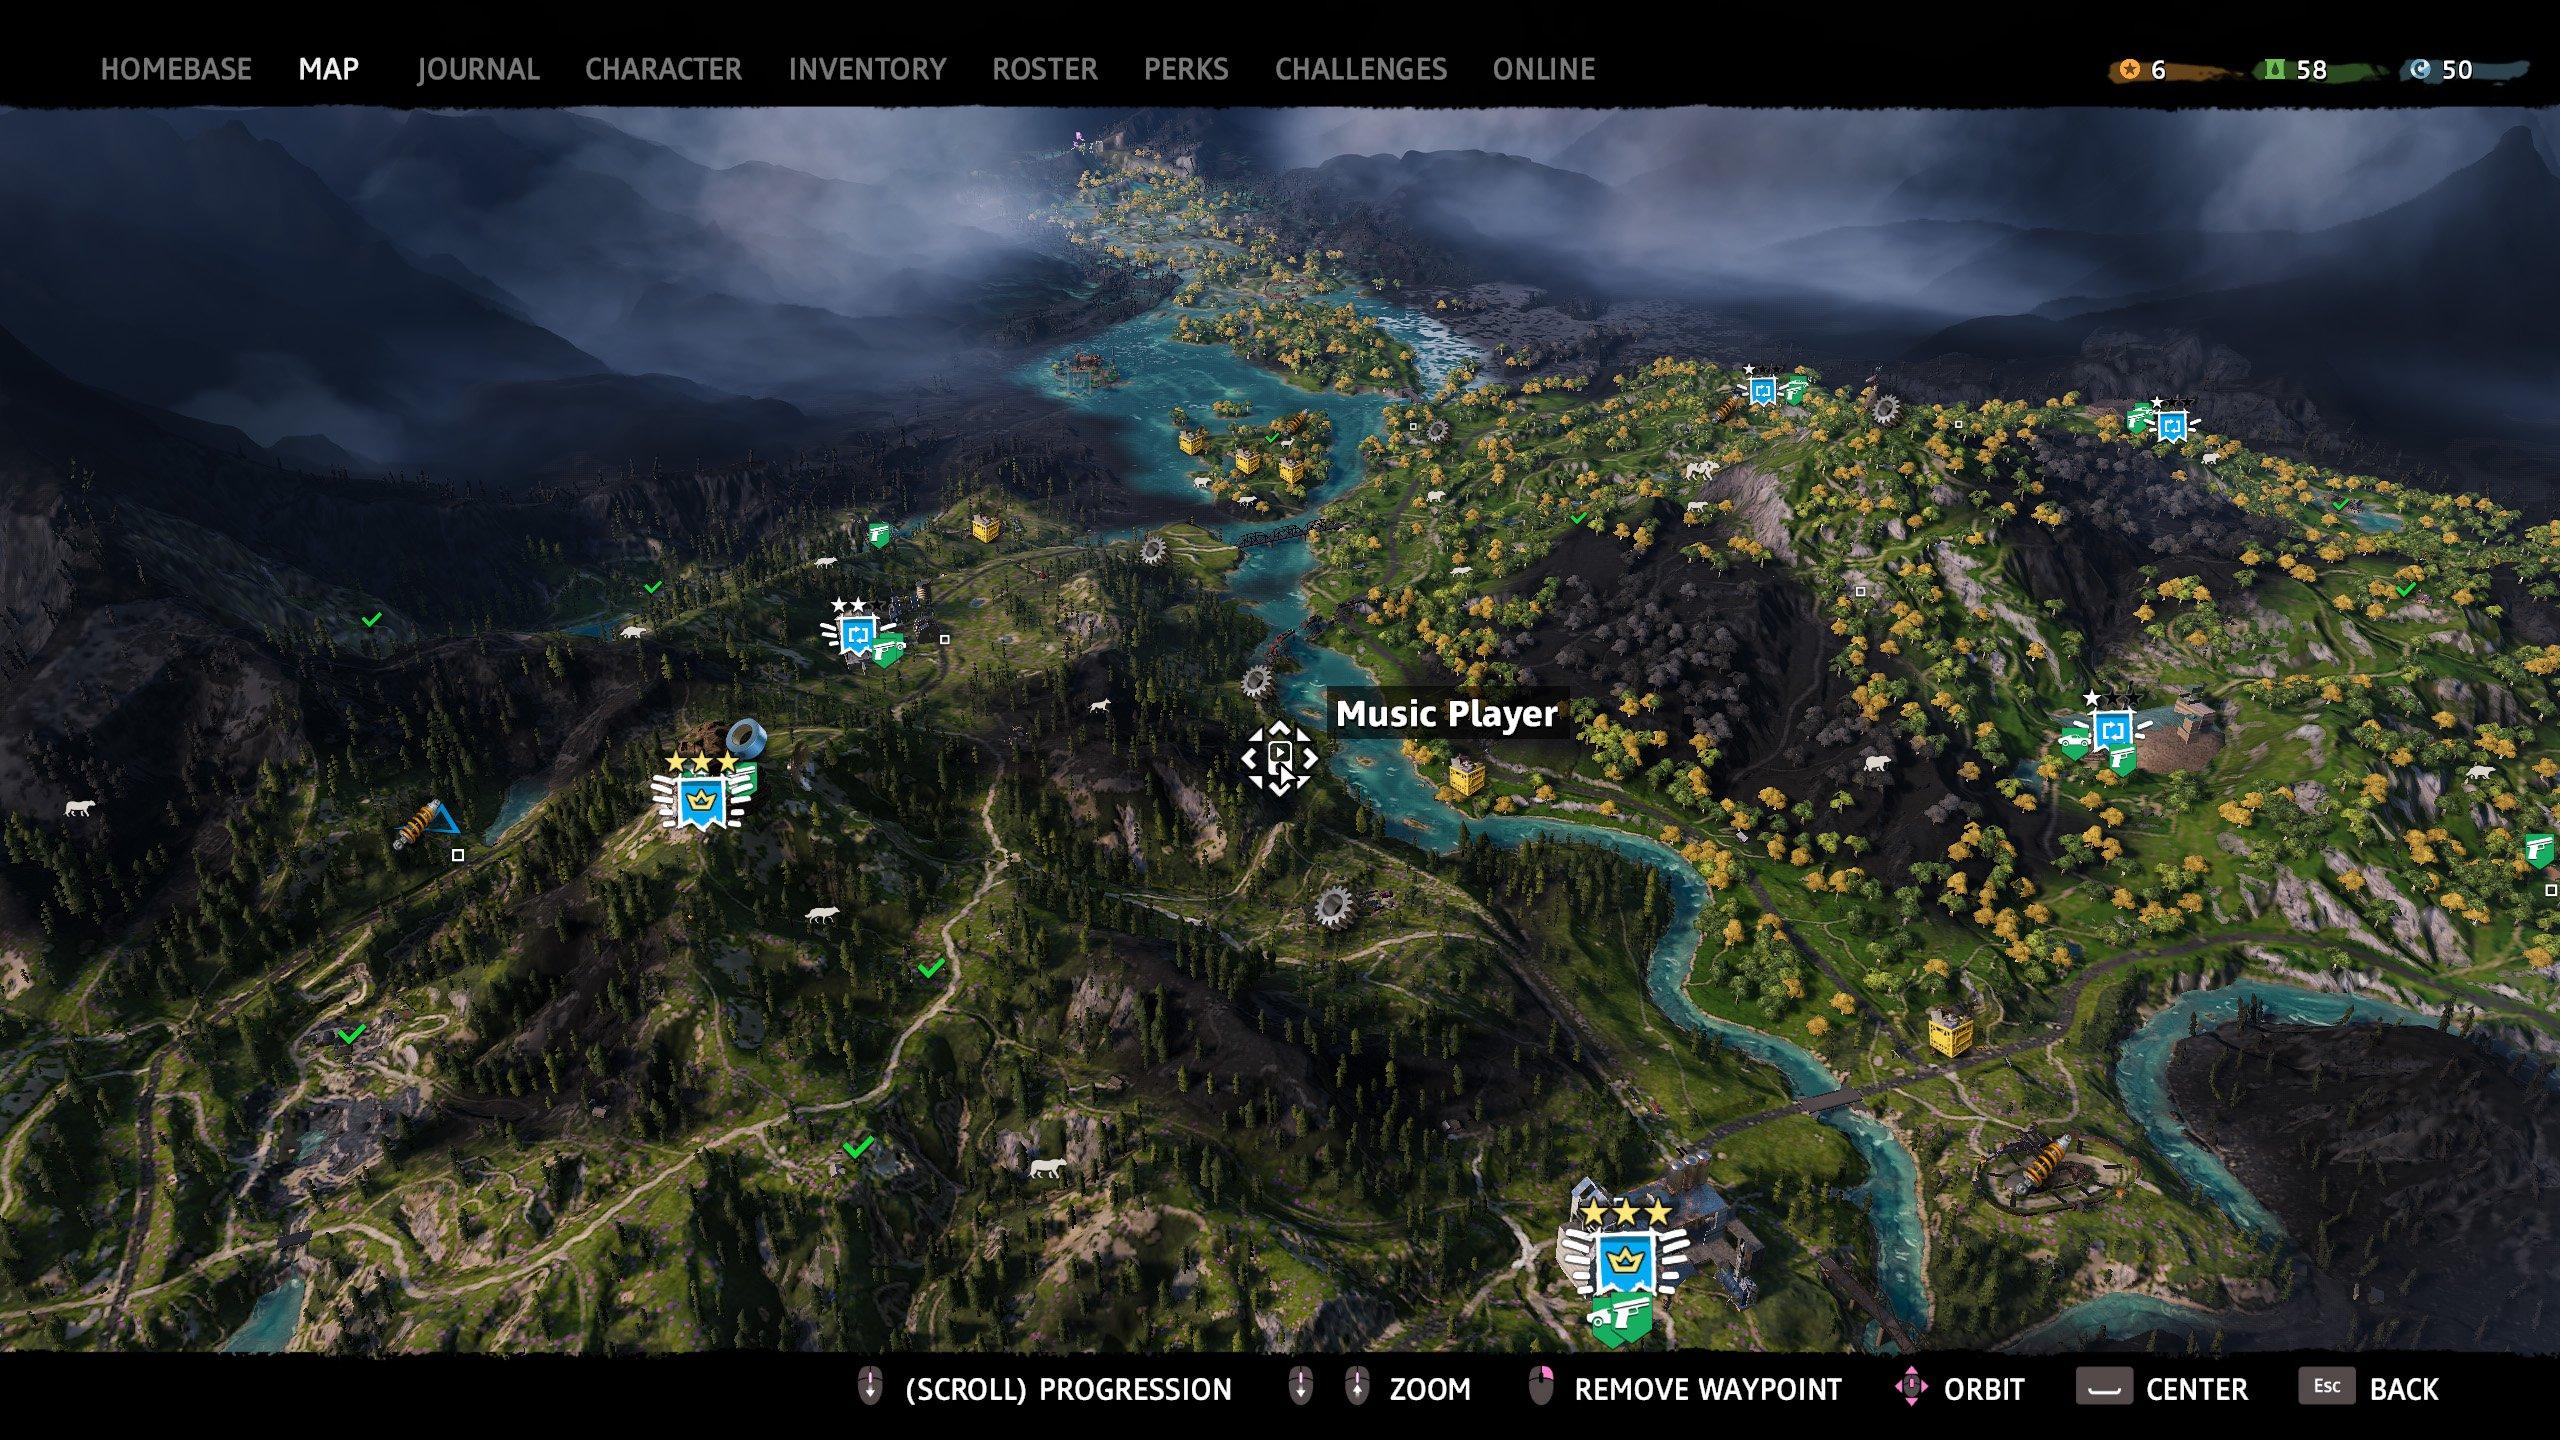 far cry new dawn music player map